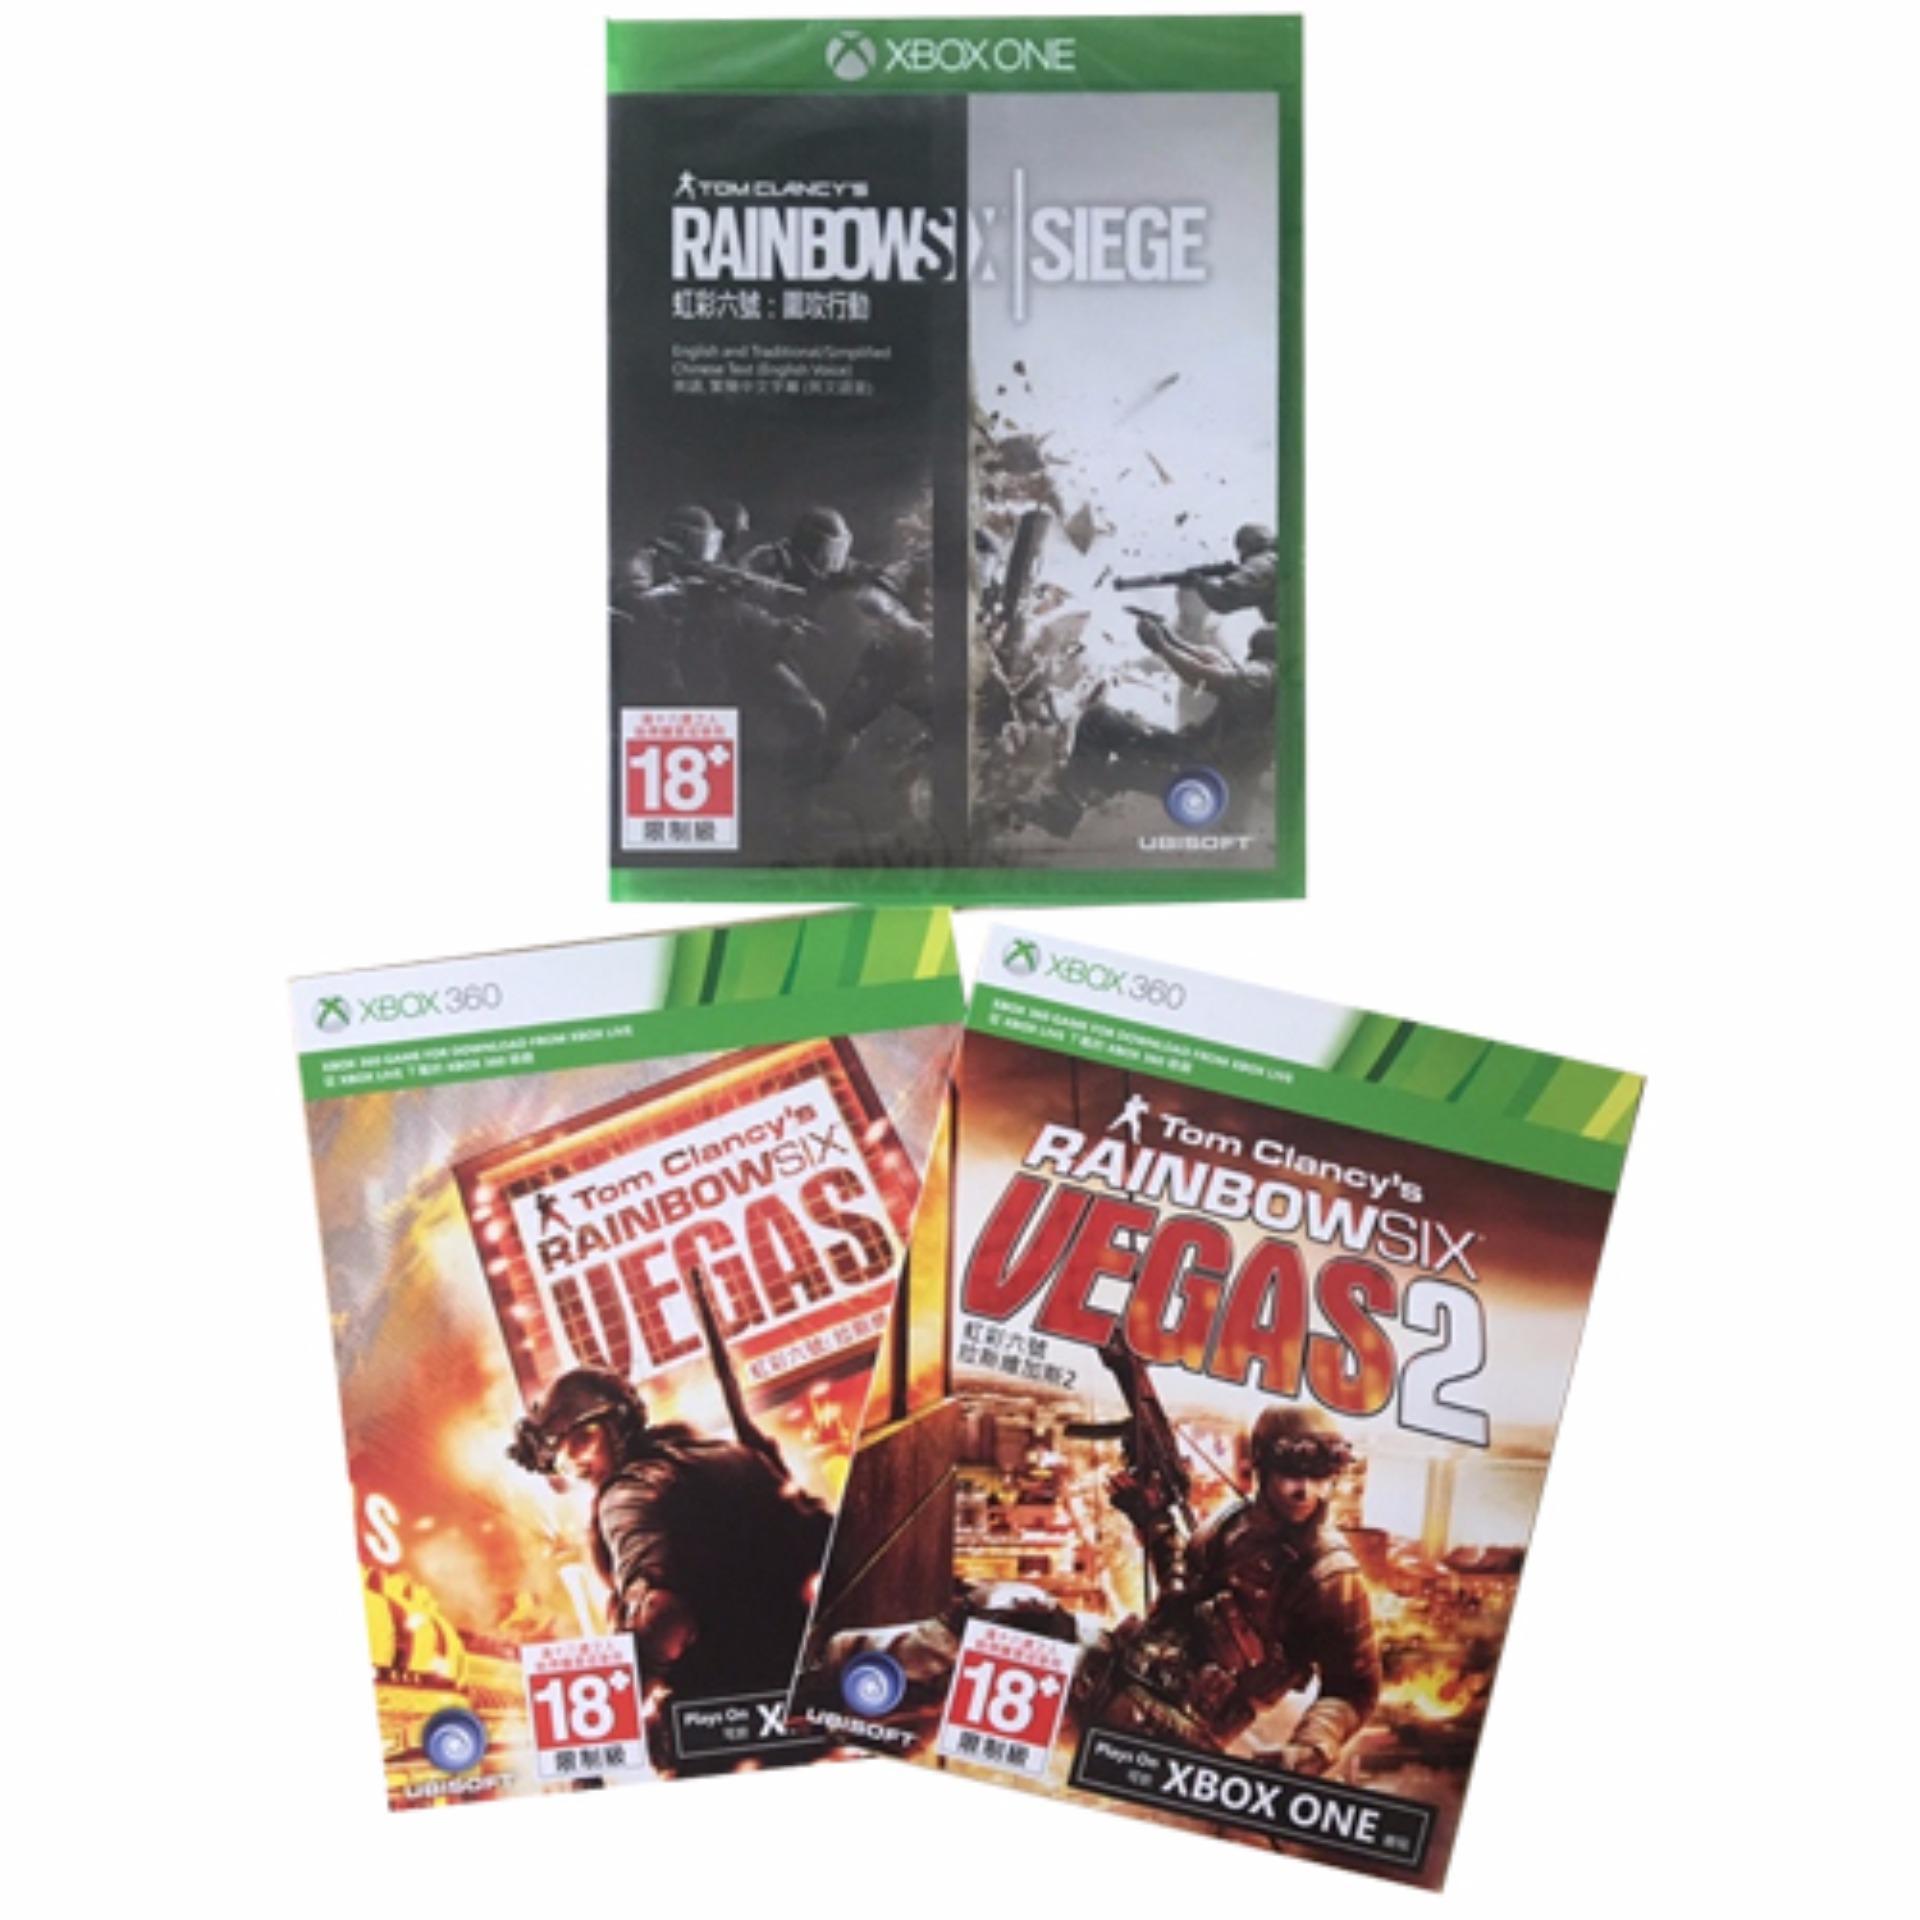 Đĩa game Tom Clancys Rainbow Six: Siege cho máy Xbox One ( Kèm 2 thẻ game Tom Clancy's Rainbow Six Vegas )